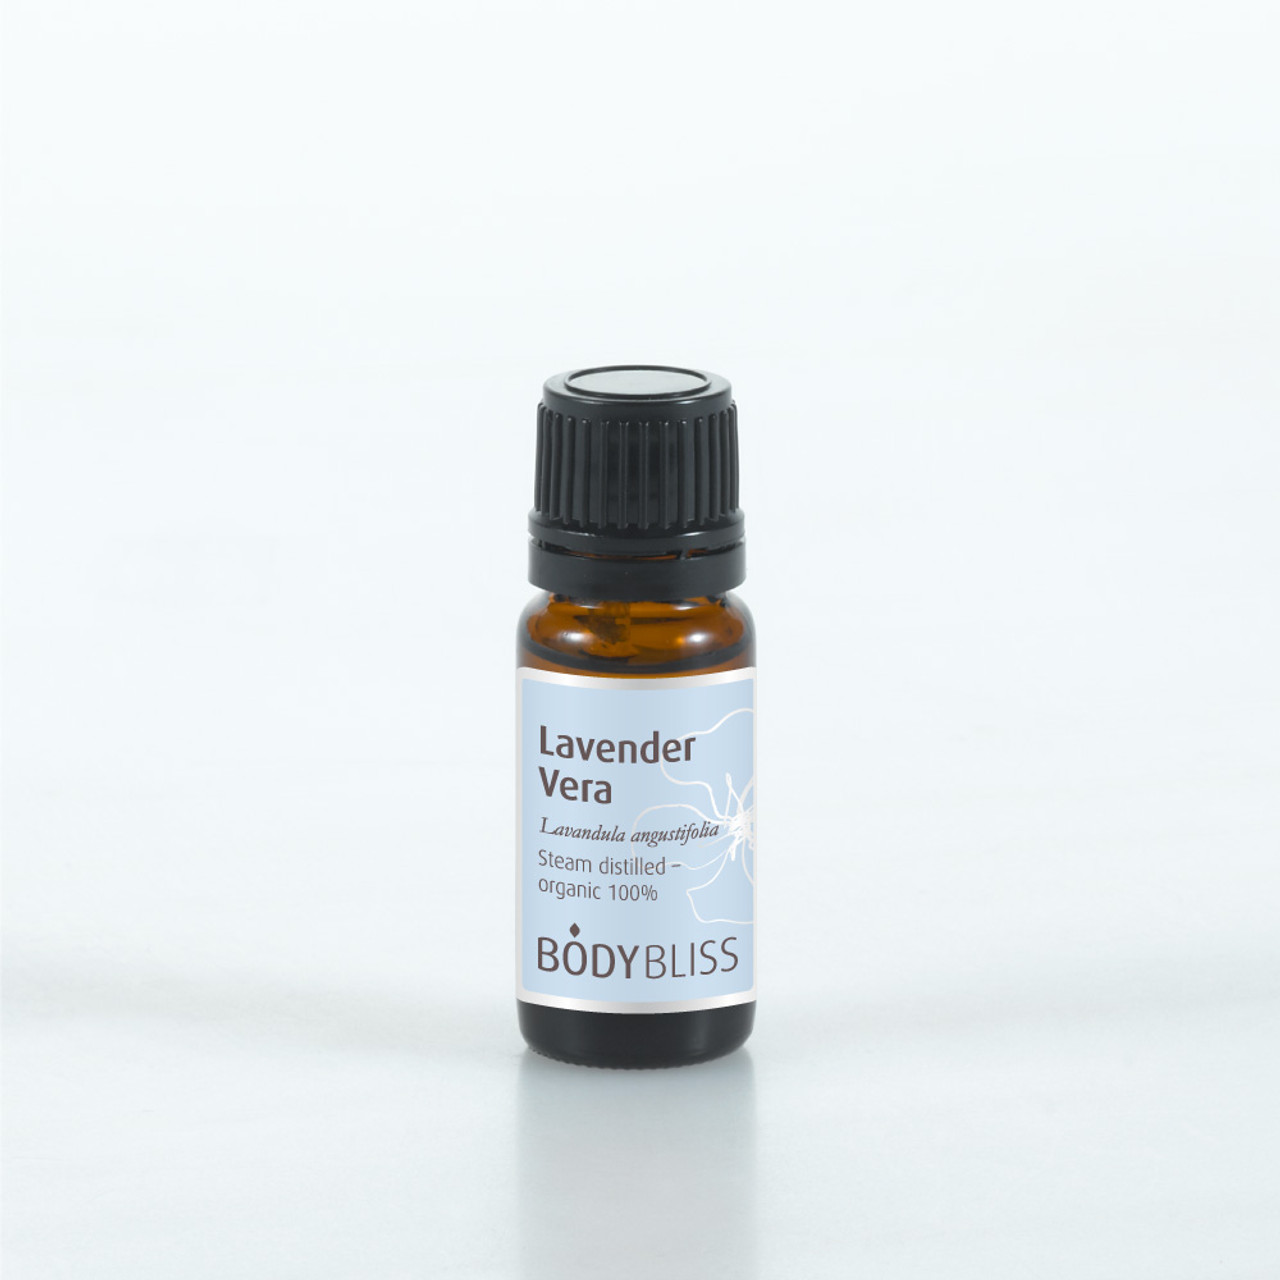 Lavender, Vera - 100% (organic)